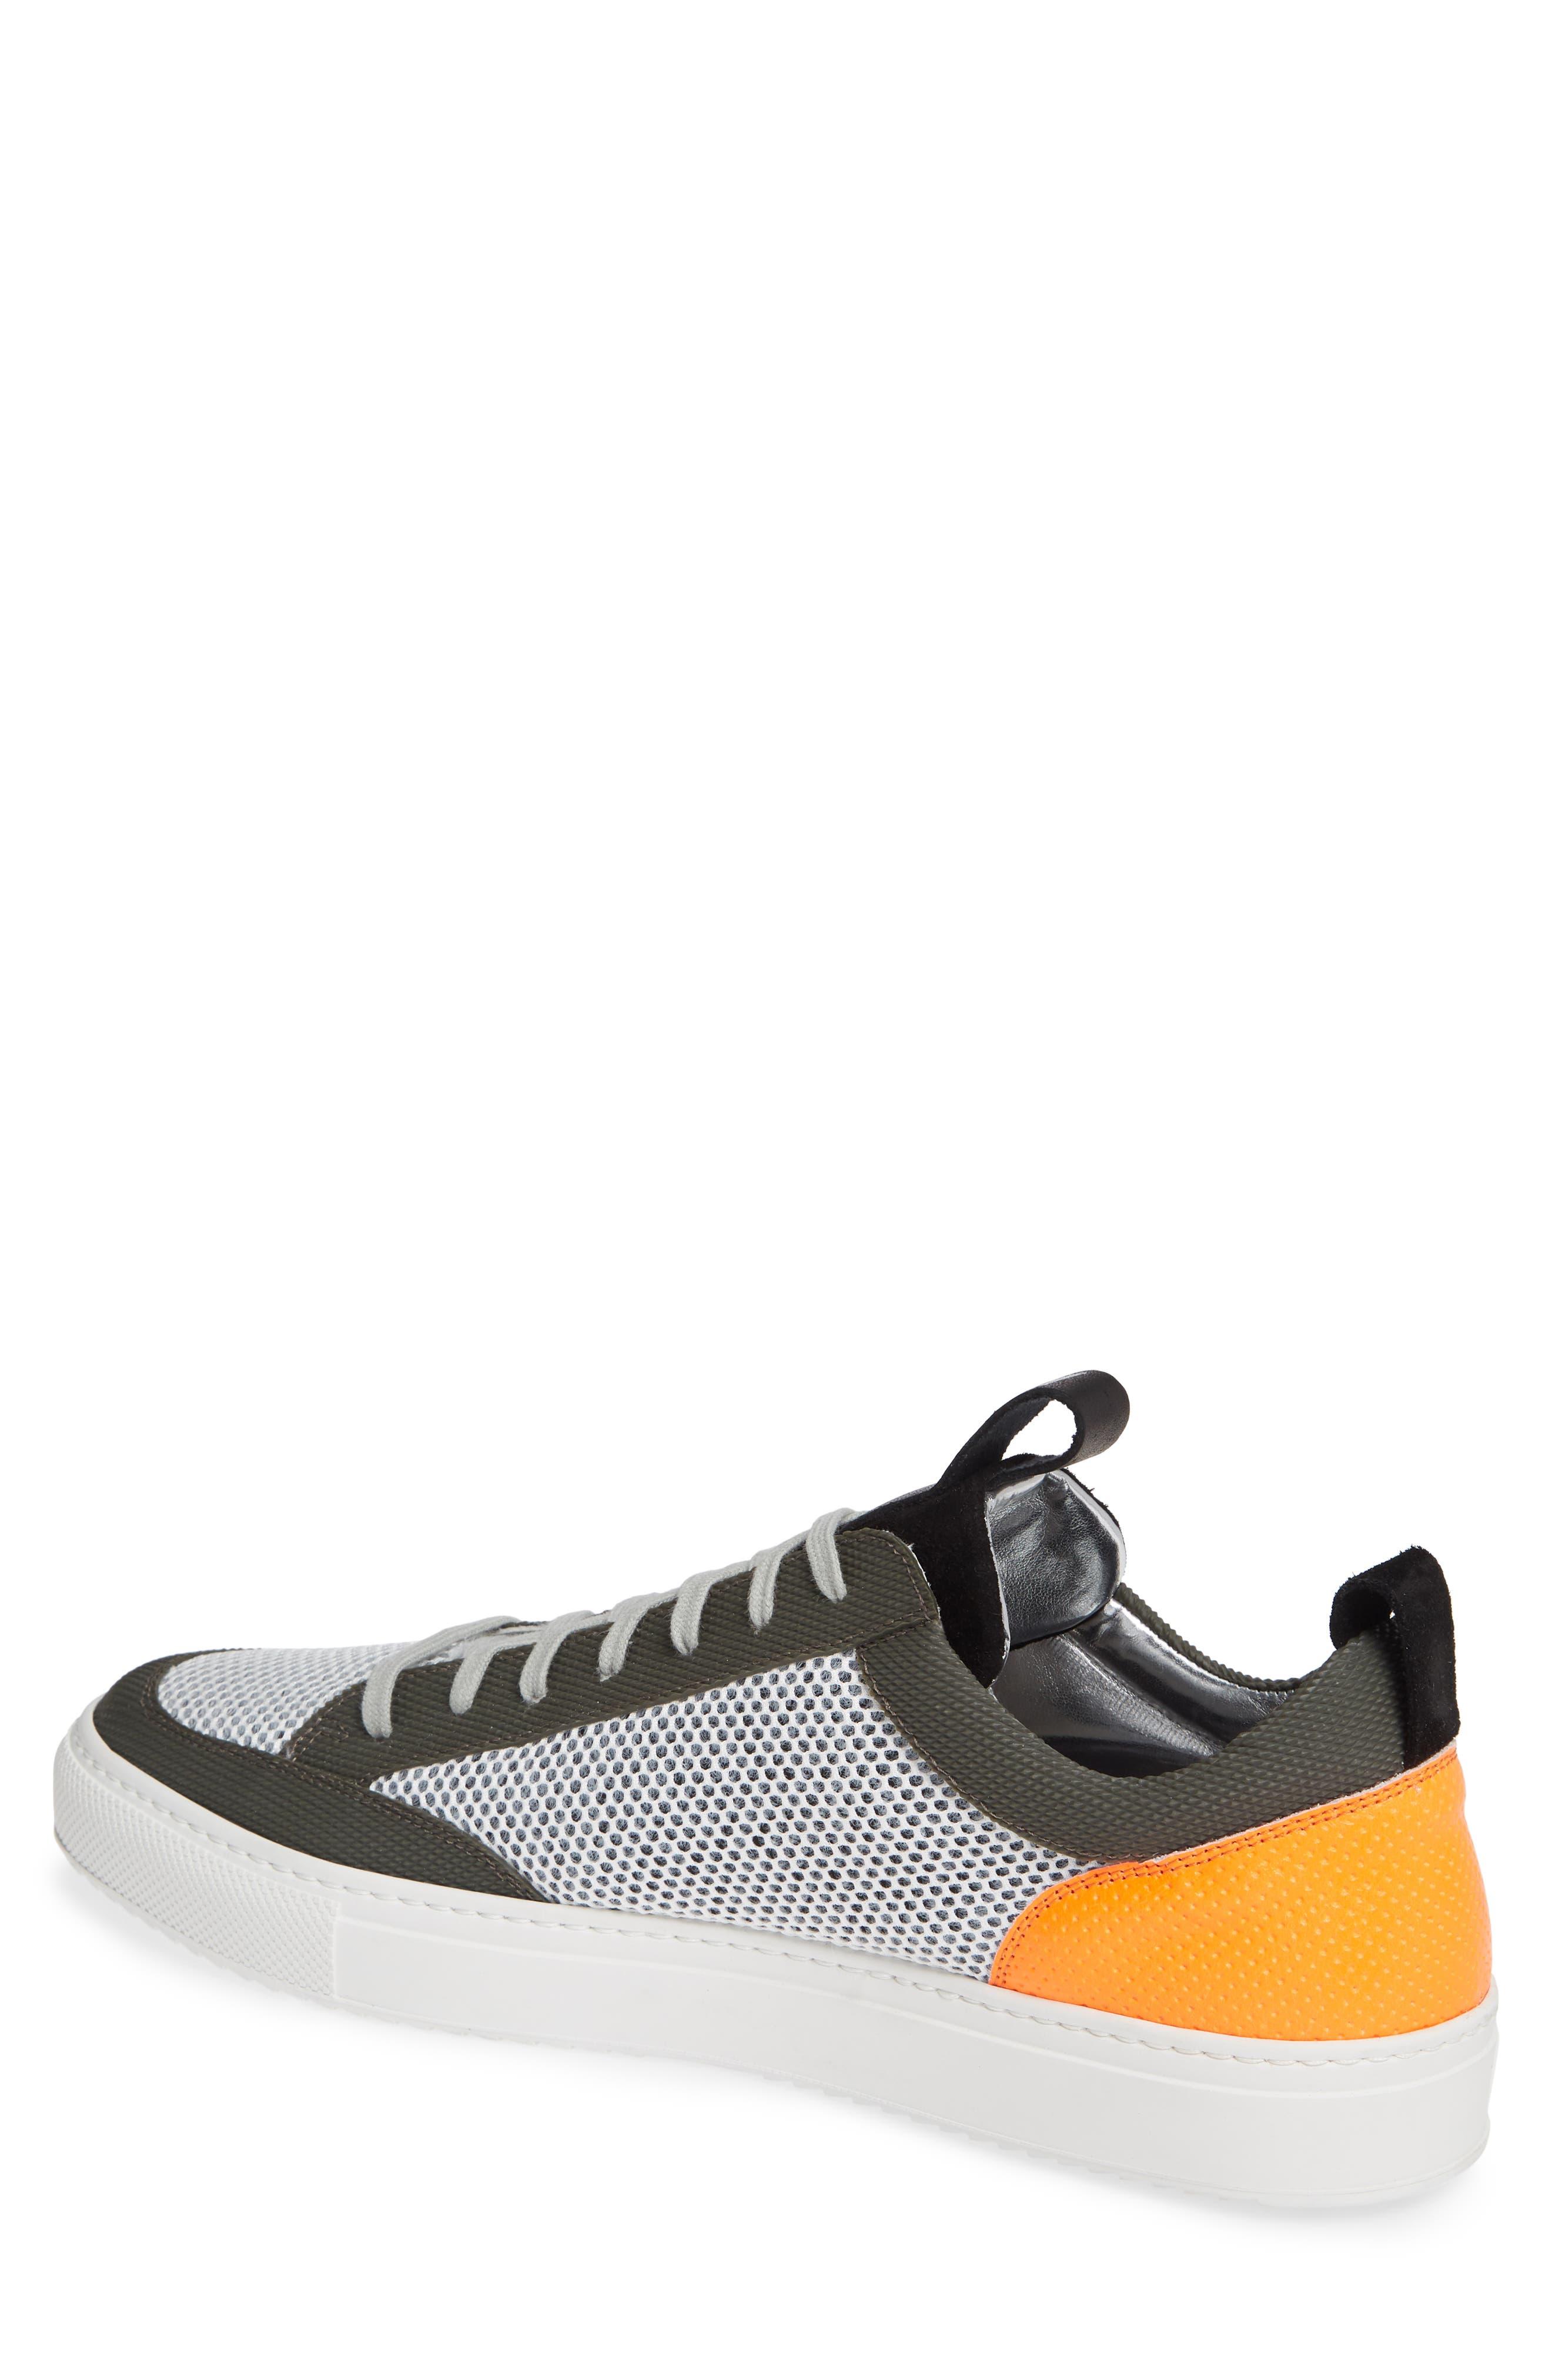 A8Soho Textured Sneaker,                             Alternate thumbnail 2, color,                             WHITE/ GREY